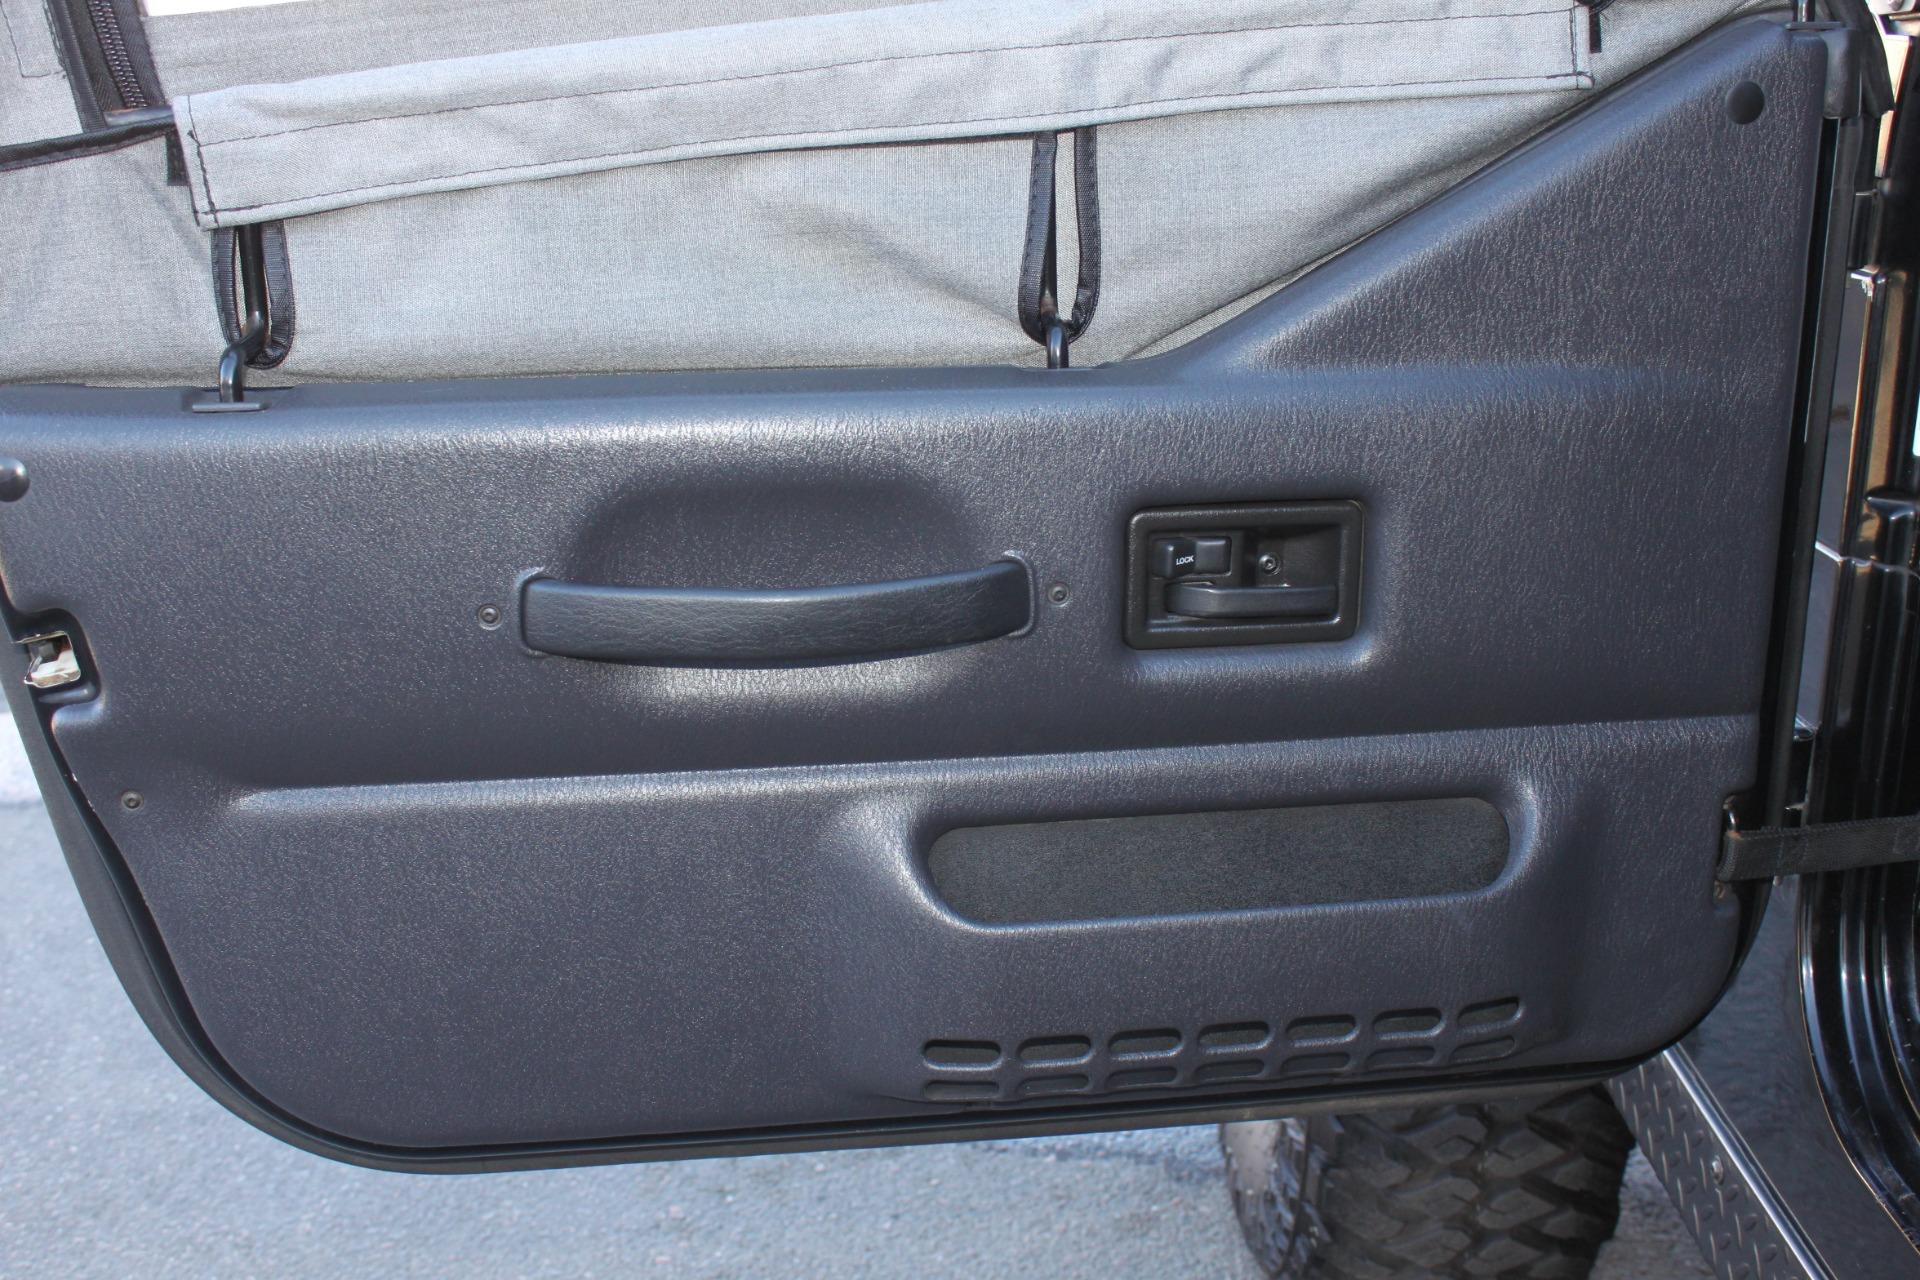 Used-2004-Jeep-Wrangler-Rubicon-XJ